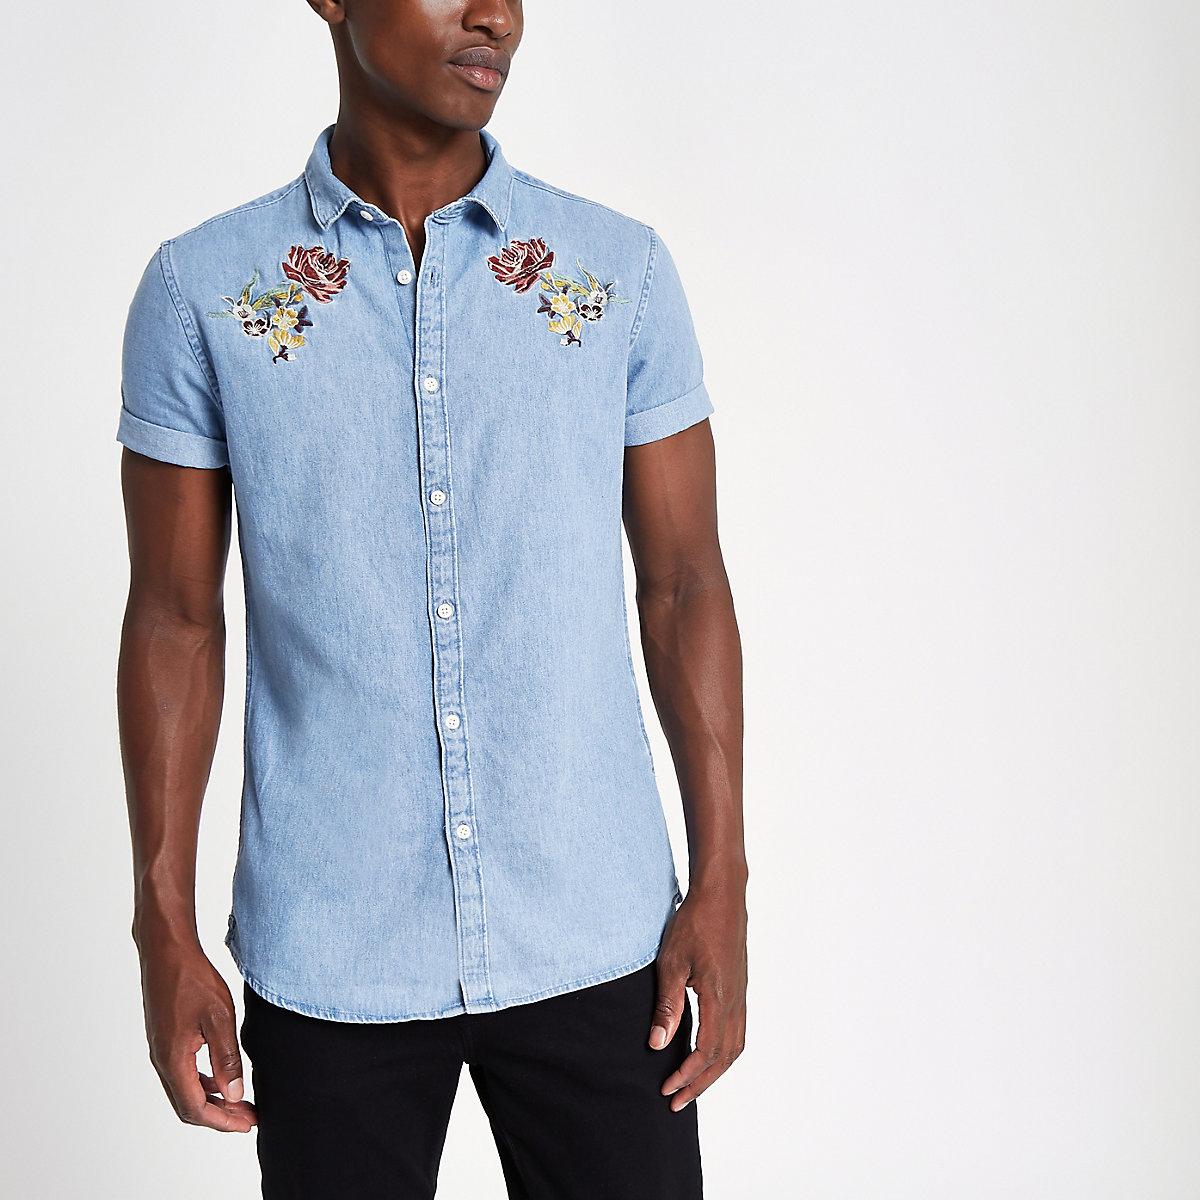 Blue slim fit embroidered denim shirt